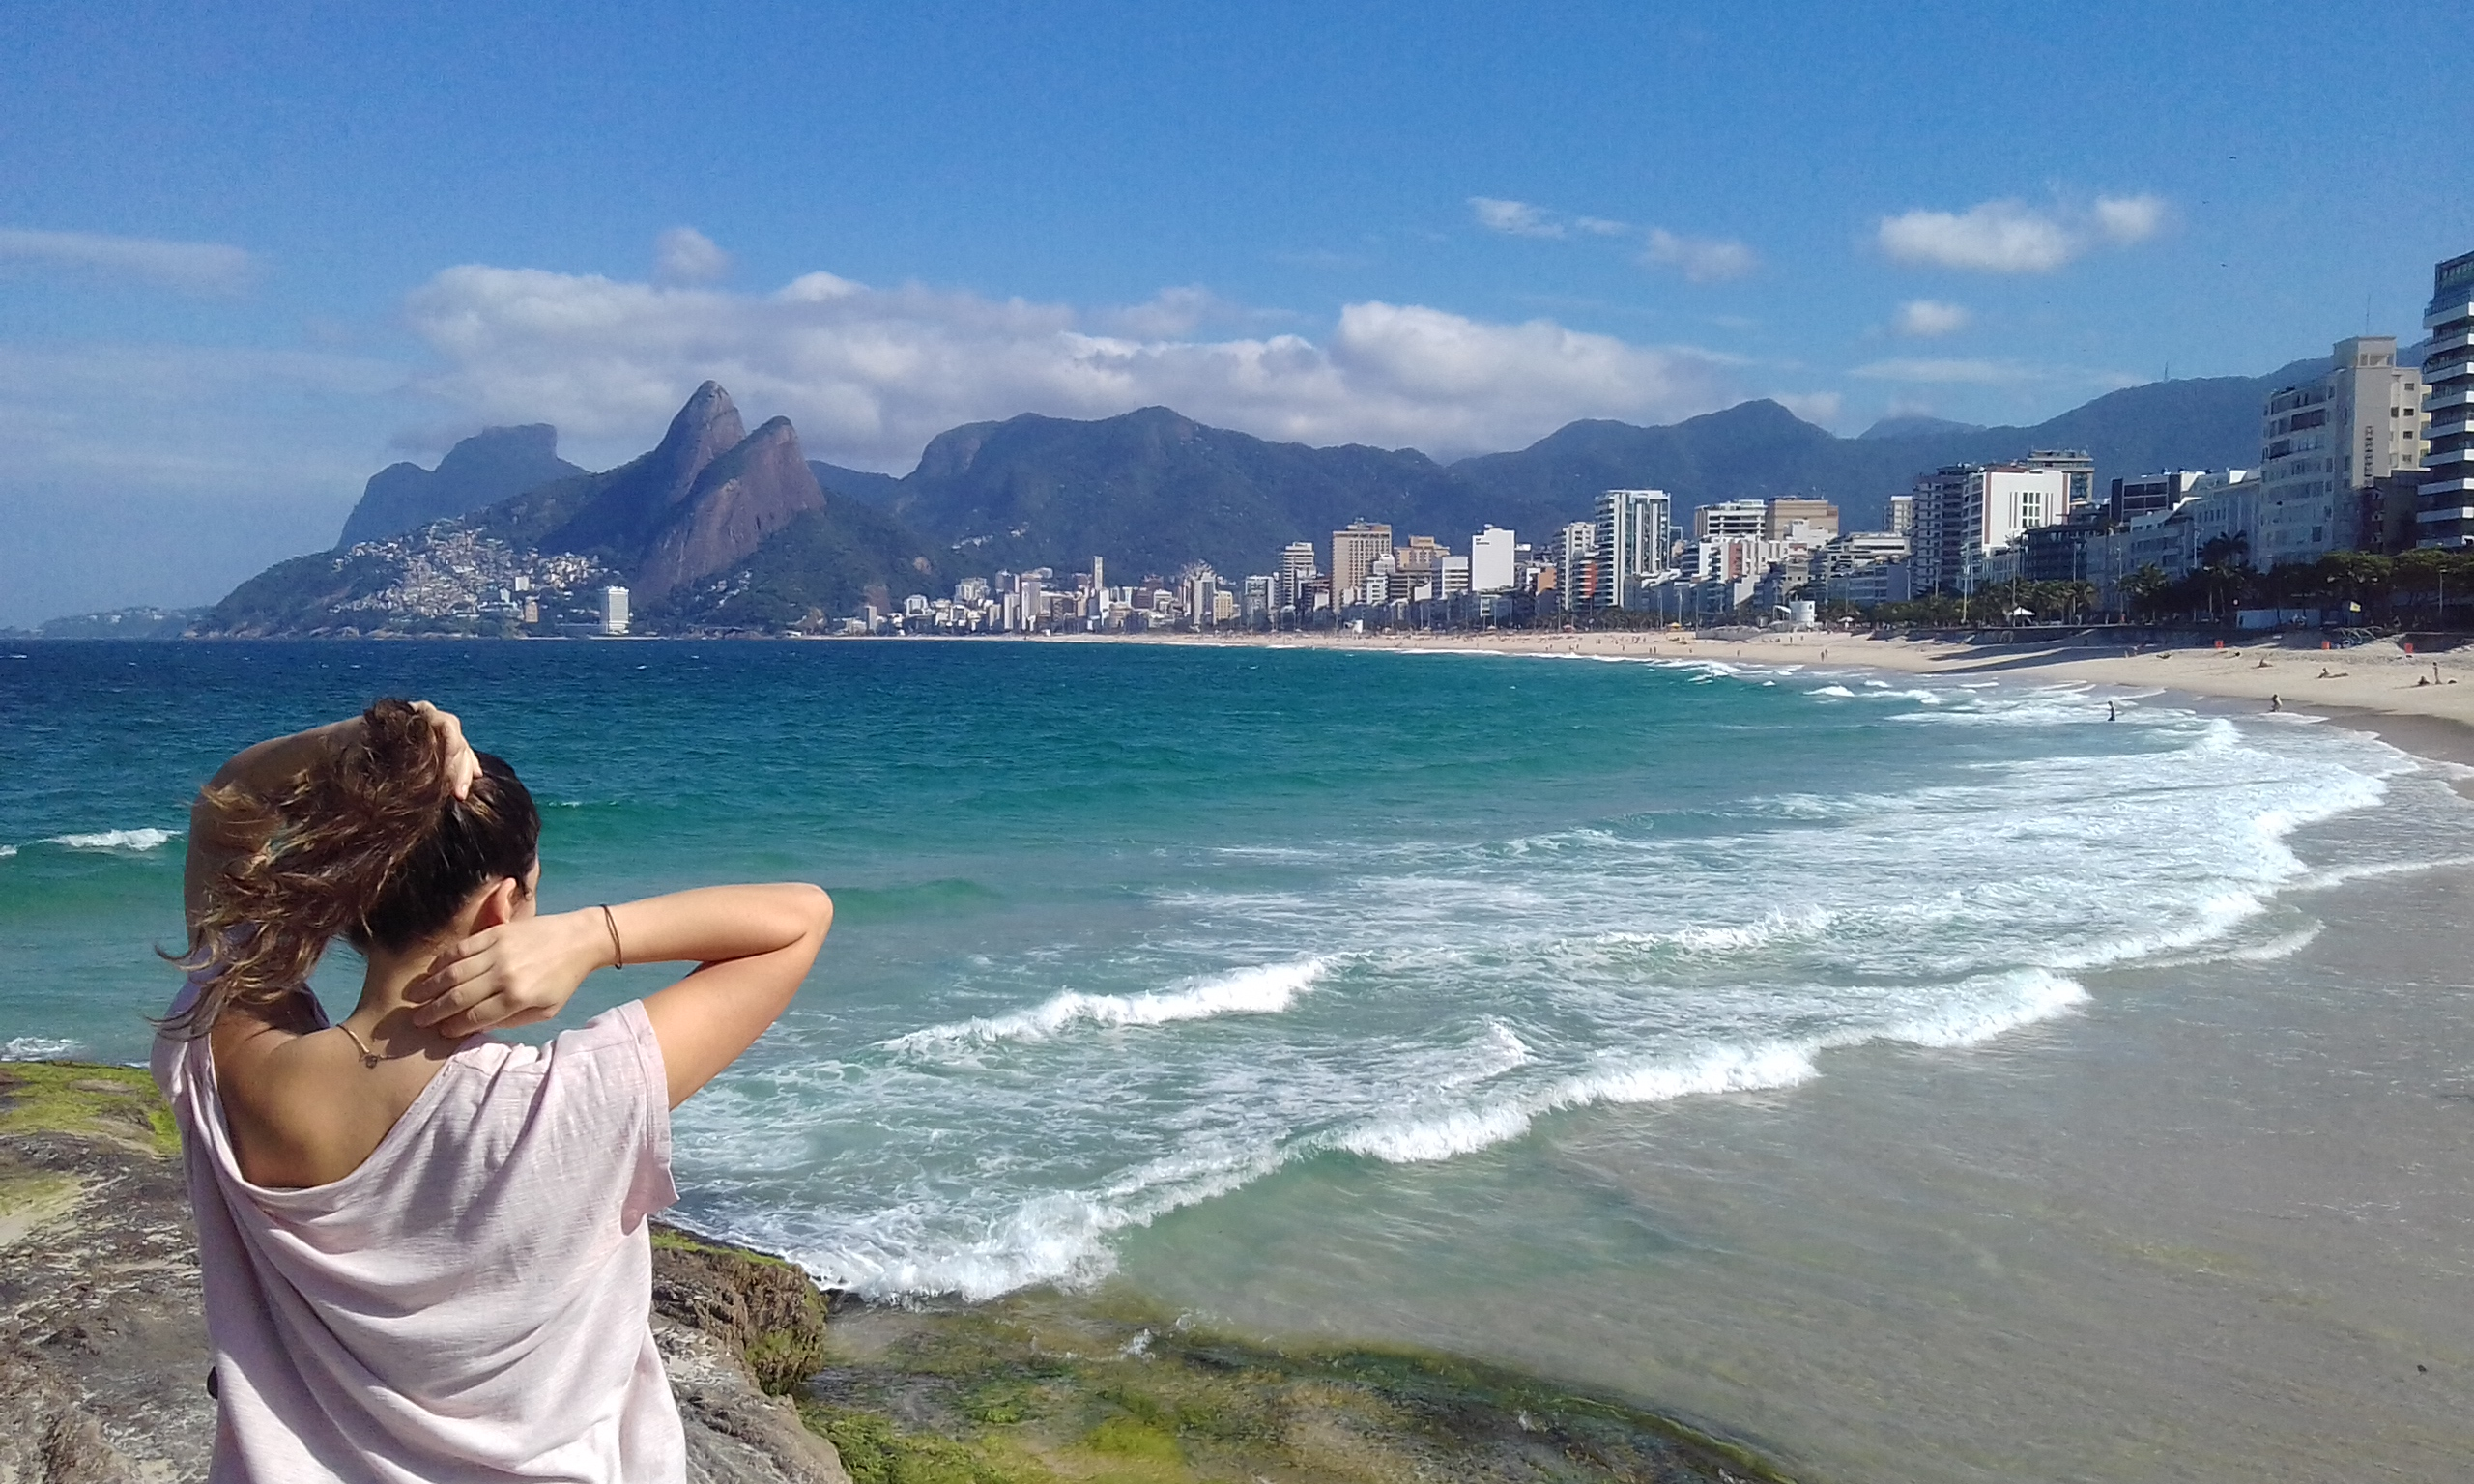 Joanna watching over Rio de Janeiro